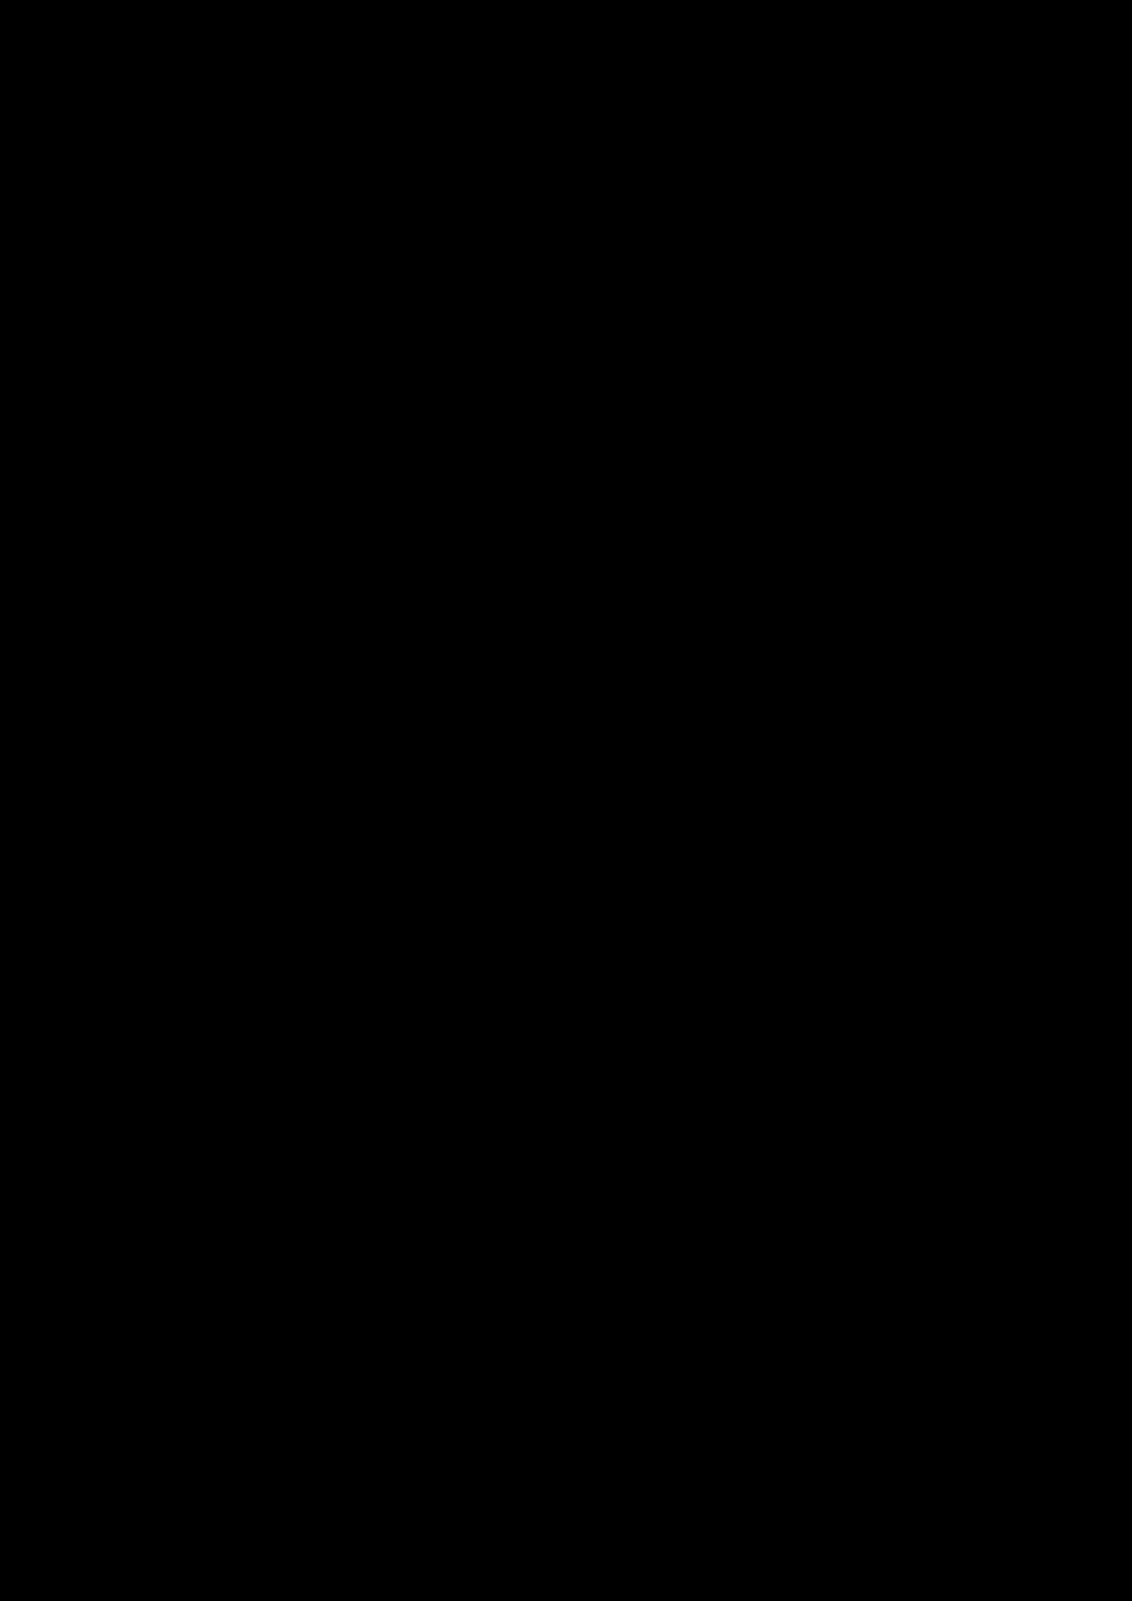 18 berez slide, Image 23